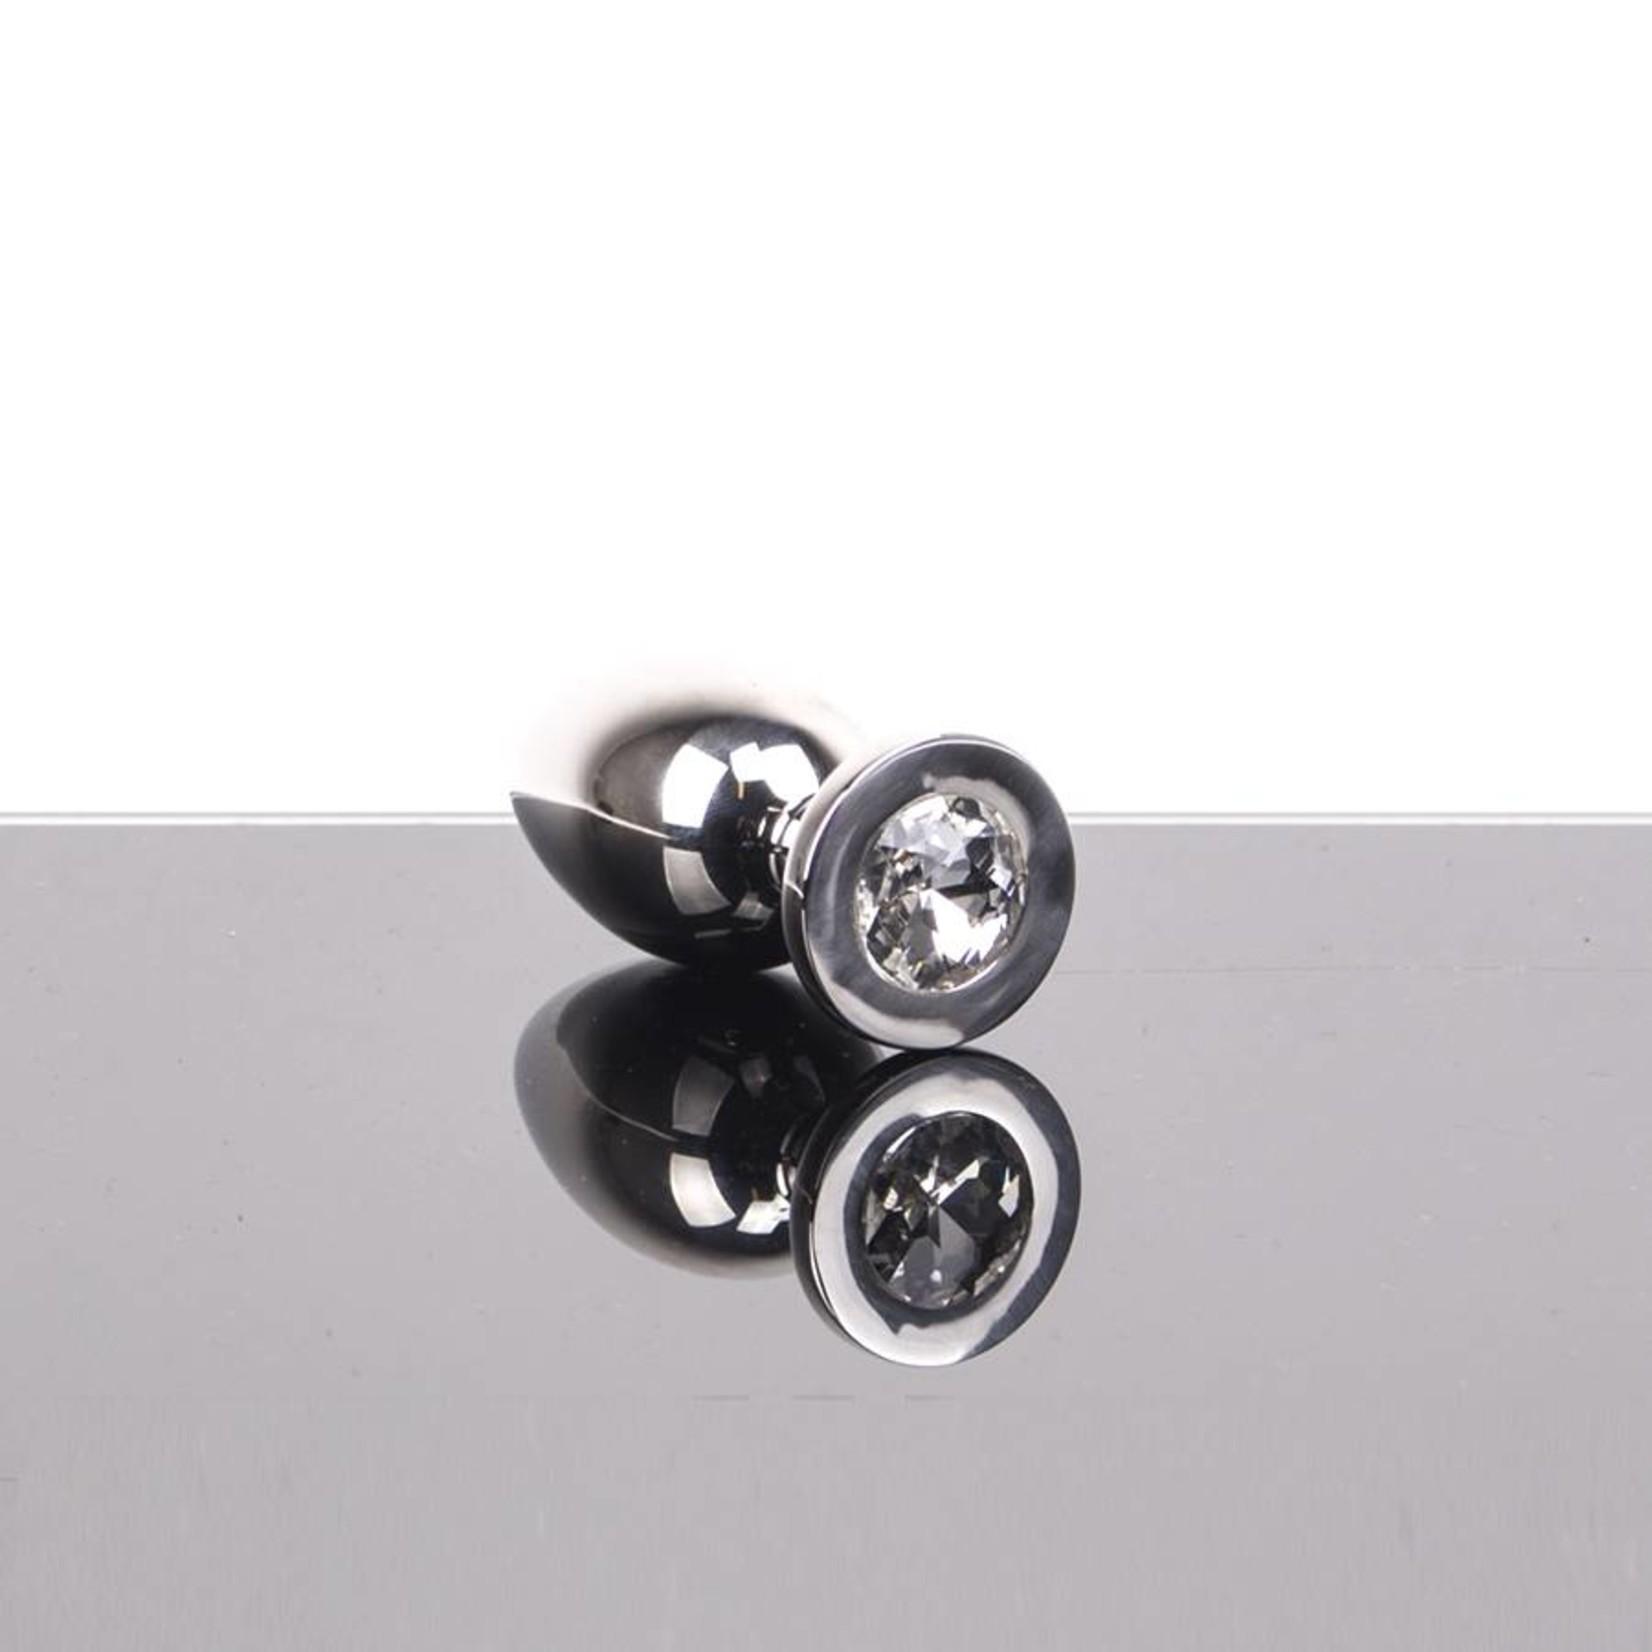 KIOTOS Steel Jeweled Buttplug (hollow) Small